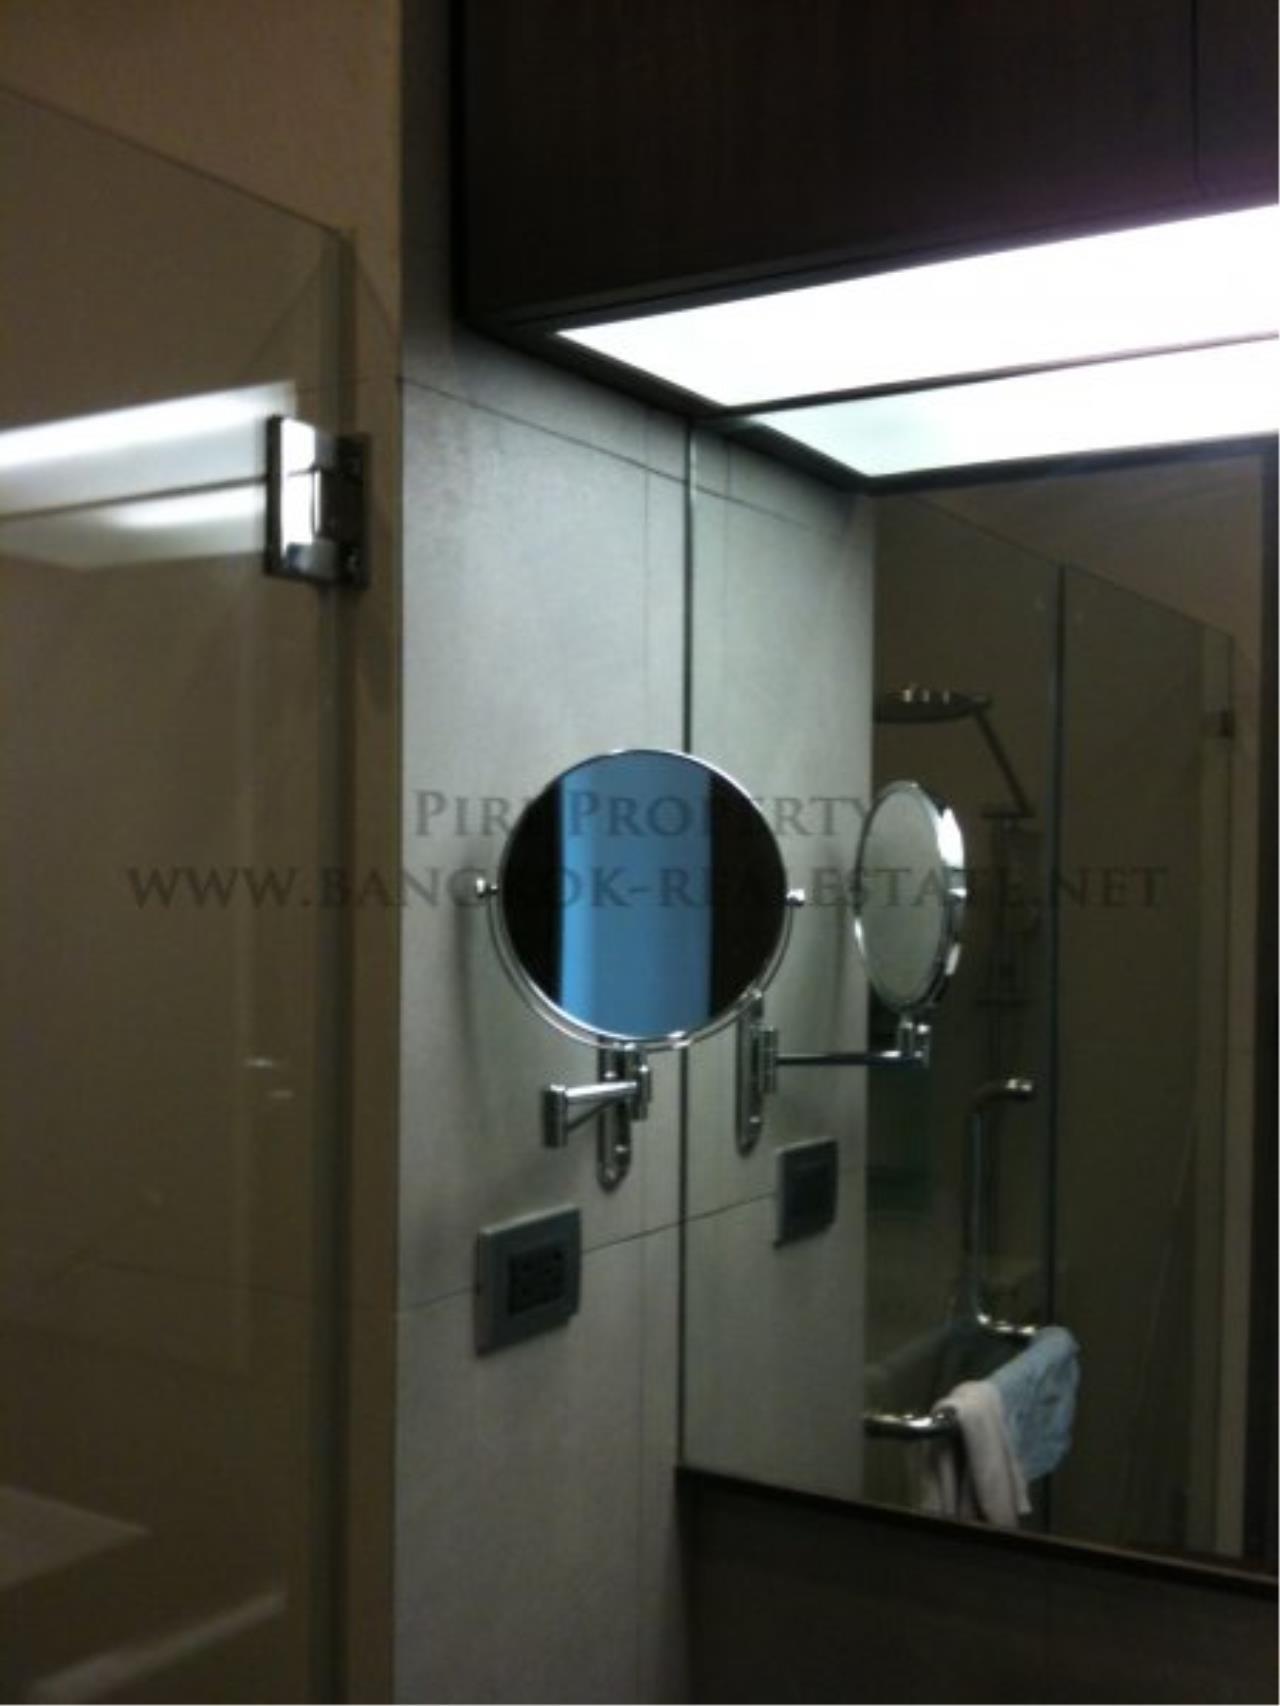 Piri Property Agency's 1 Bedroom condo - Noble Reflex in Ari 3